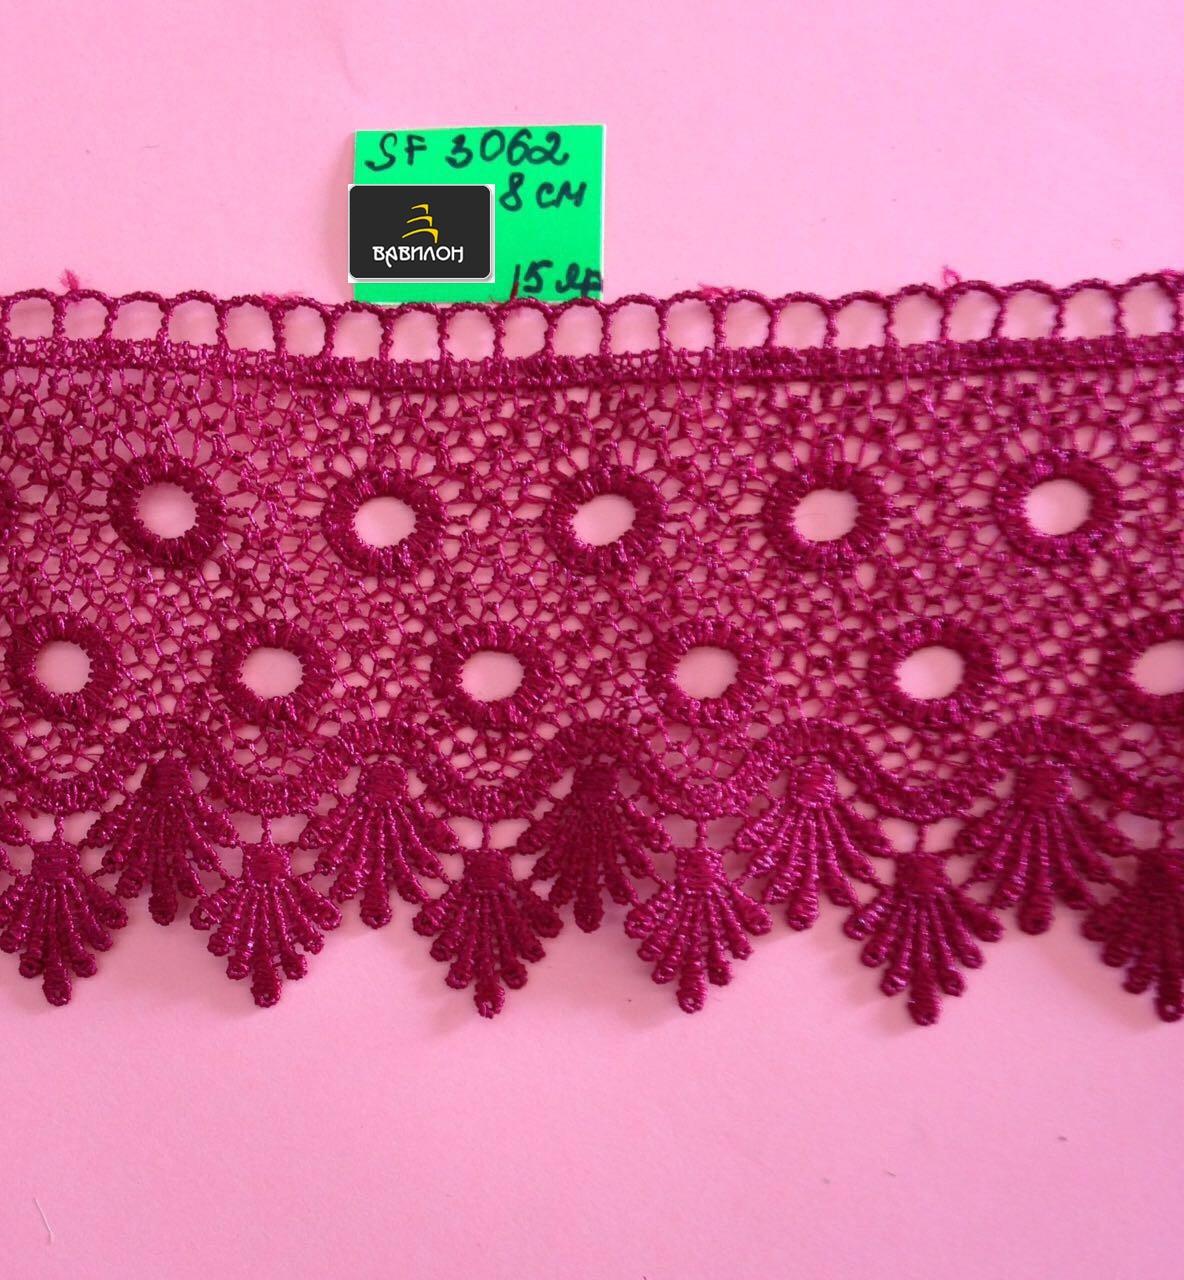 Кружево  вязаное 8 см  (SF3062) 15 ярда (бордовый)